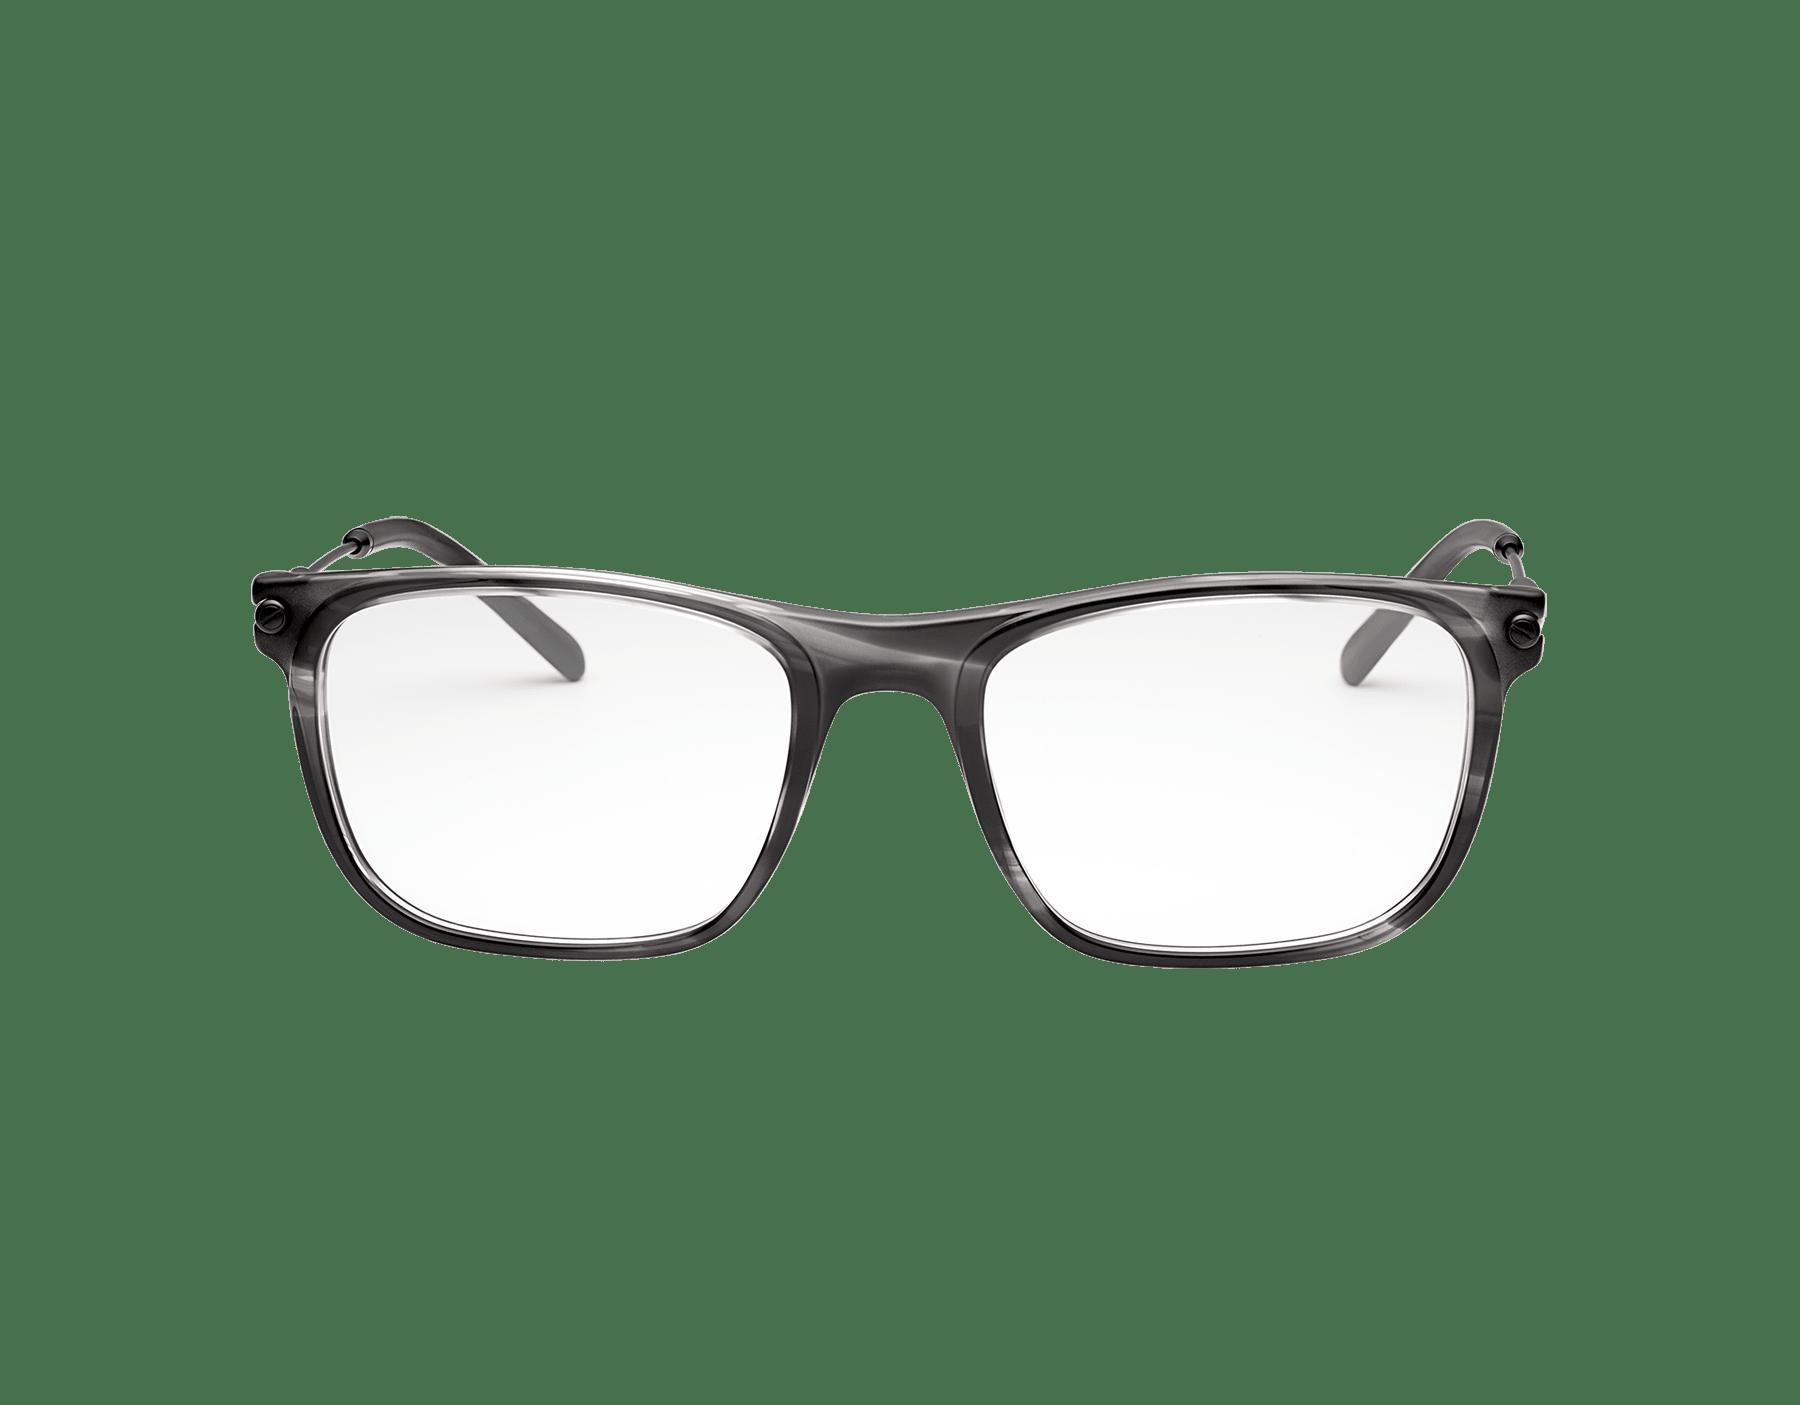 Diagono rectangular acetate eyeglasses. 903634 image 2